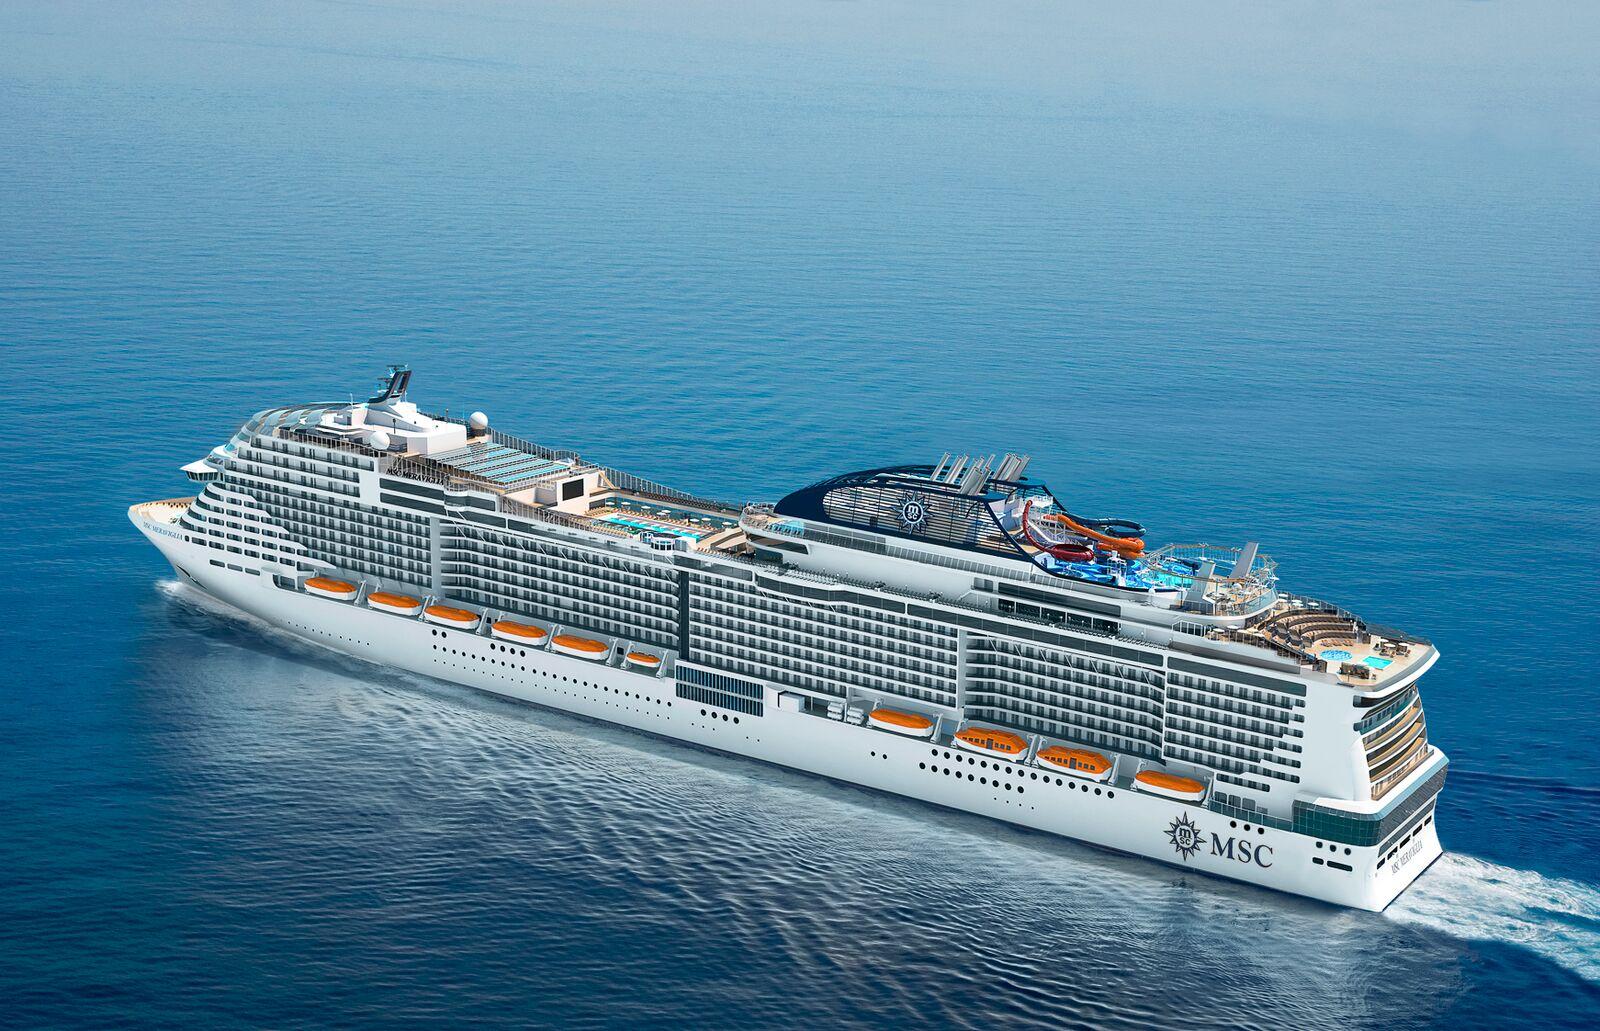 Msc Meraviglia Cruise Bookings 2019 2020